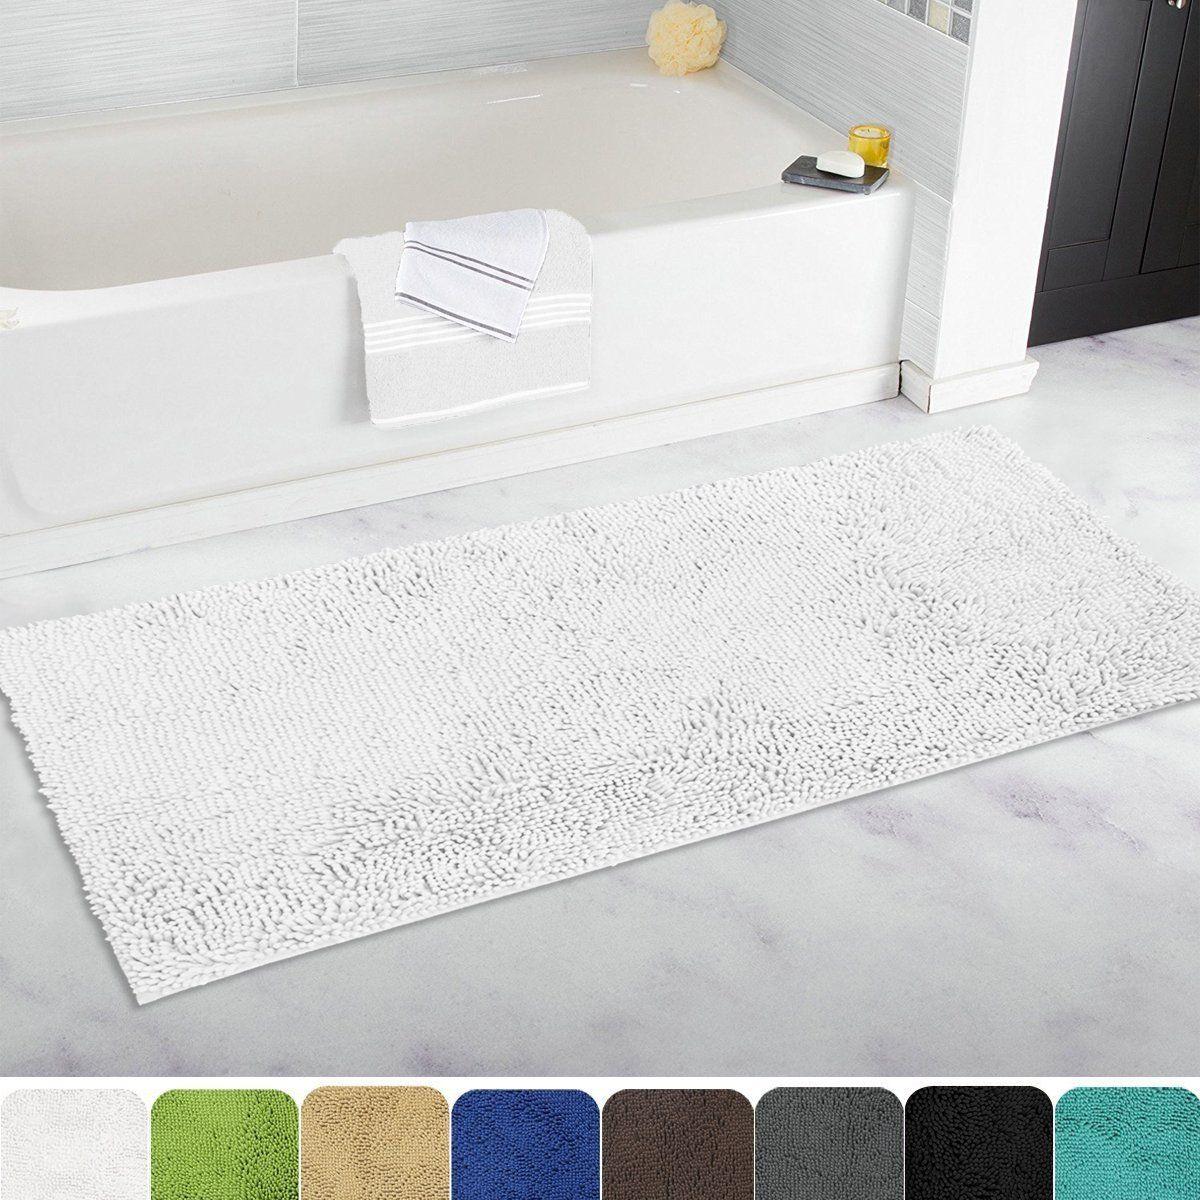 Amazon Com Mayshine Bath Mat Runners For Bathroom Rugs Long Floor Mats Extra Soft Absorbent Thickening Shaggy Microfi Bath Mat Runner Bathroom Rugs Bath Mat